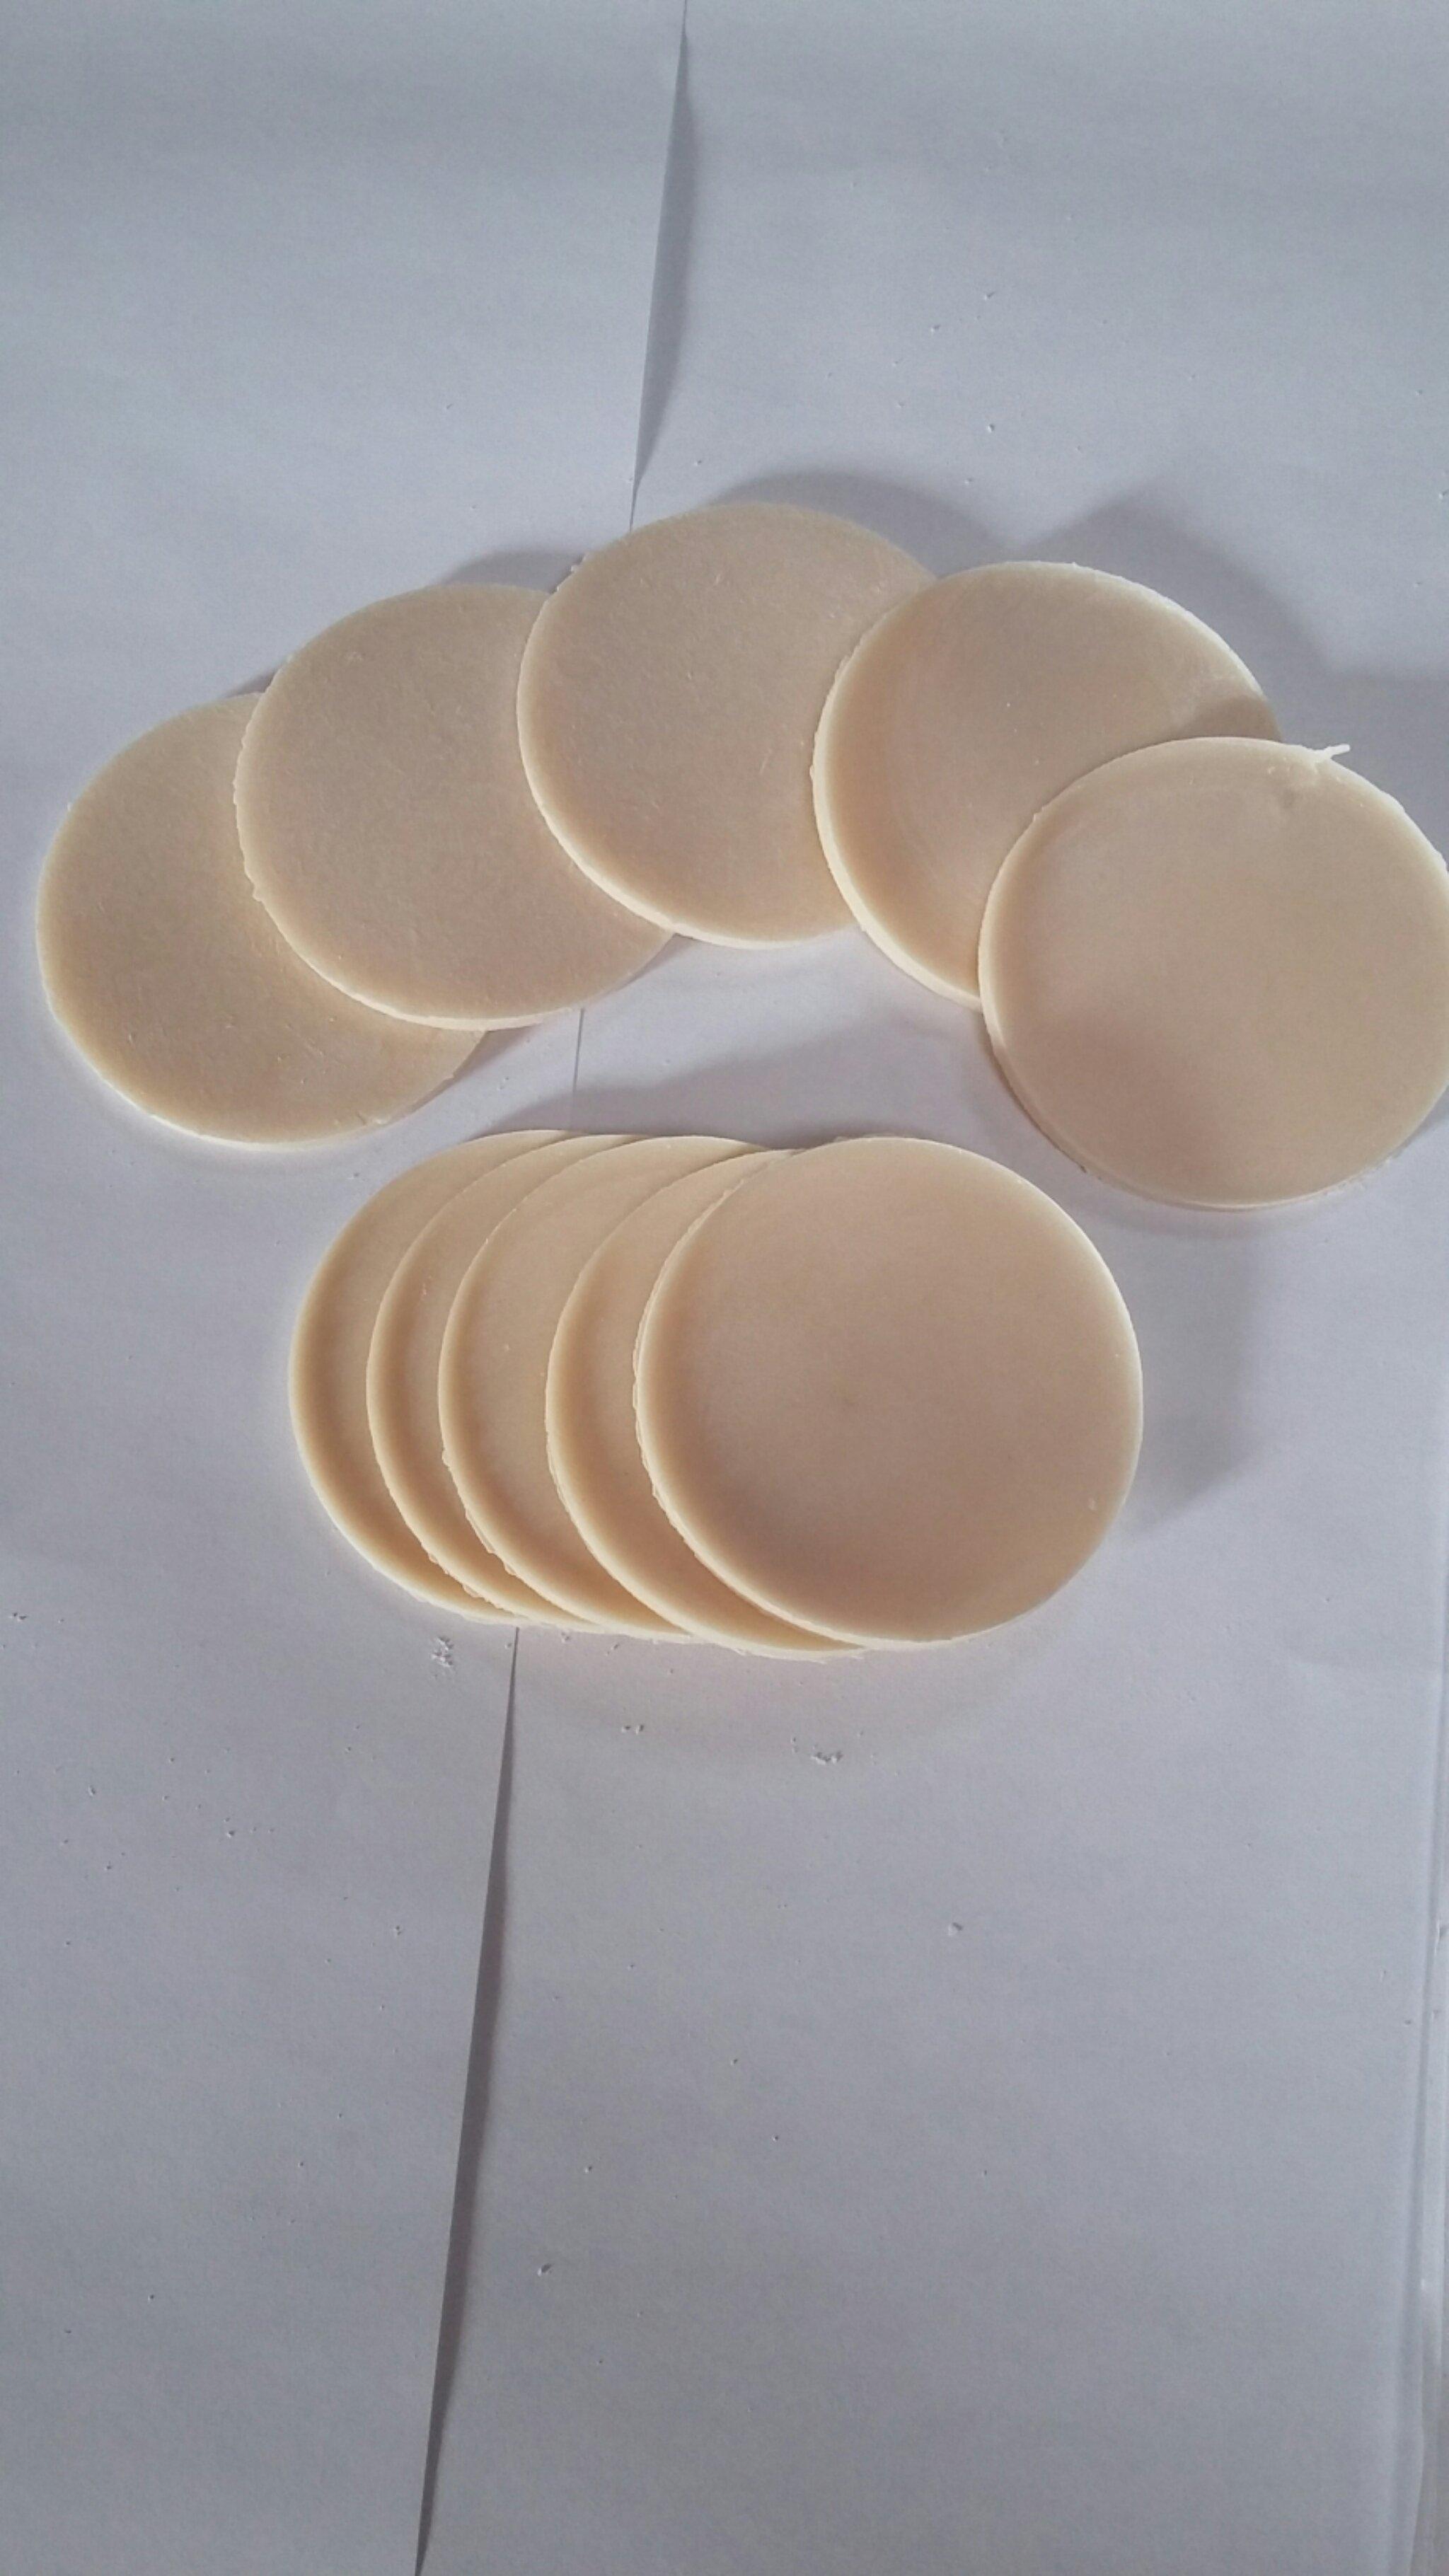 Medical tattoo practice/PMU replacement discs (pack of 10) 00011